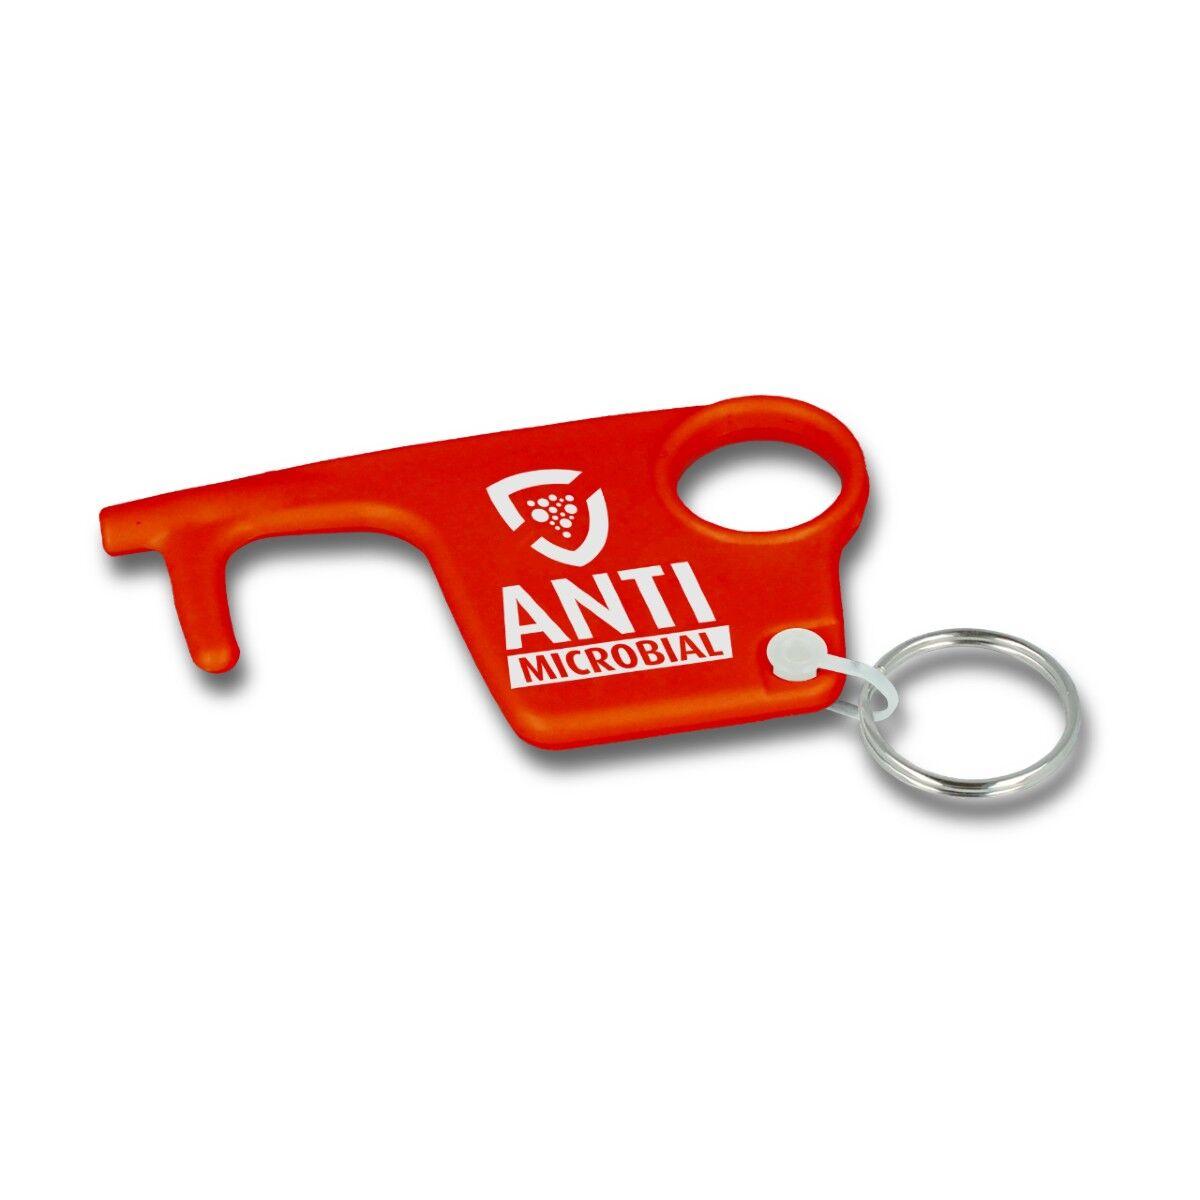 Antibac Recycled Staysafe Hook Keyring - Red